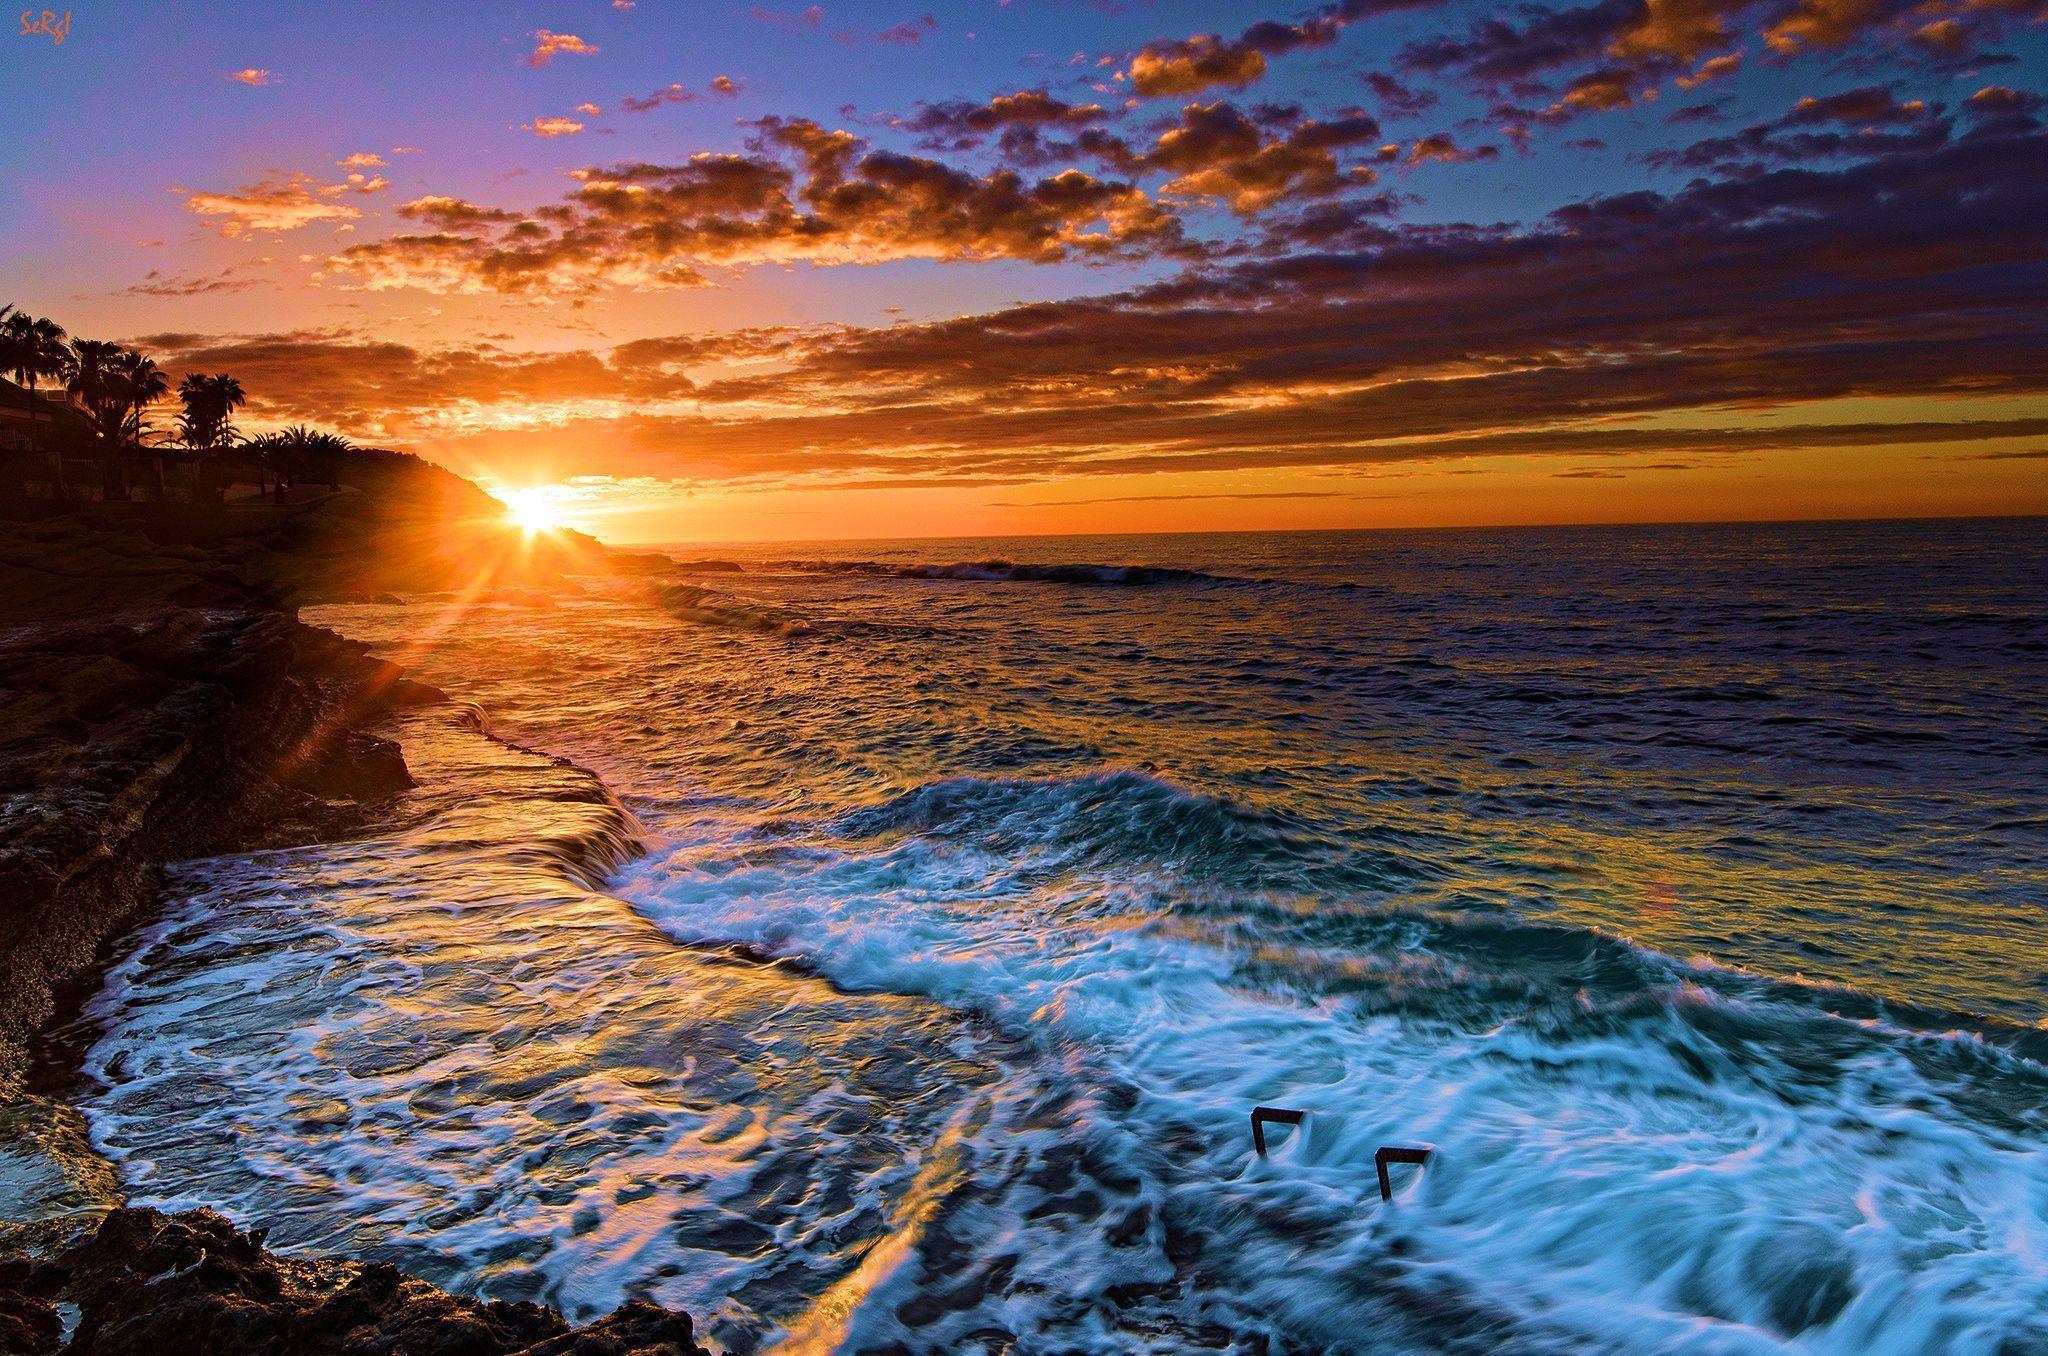 Sunset Desktop Backgrounds 2048x1356